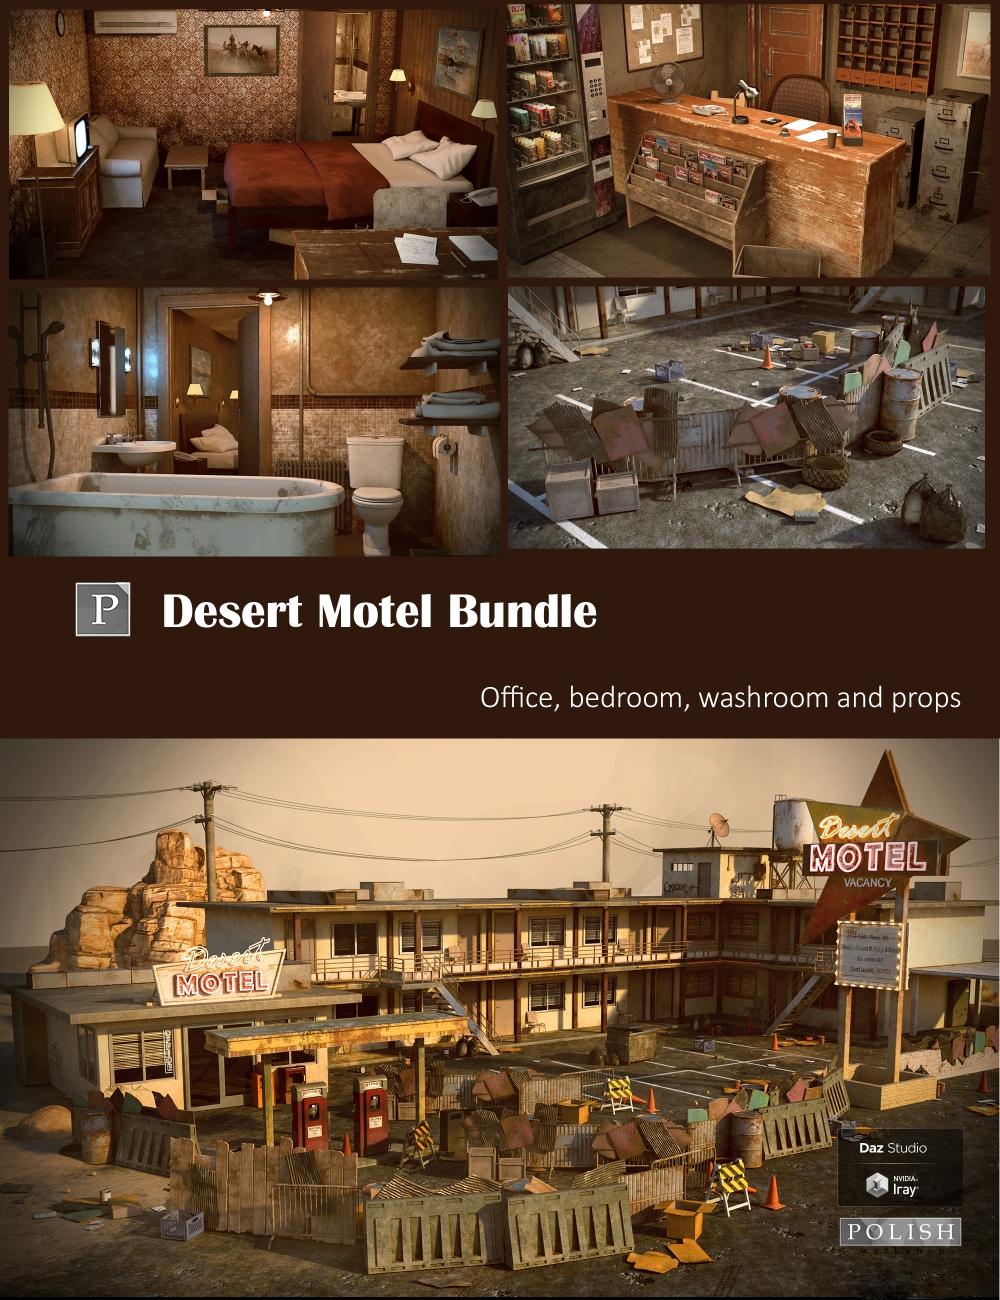 Desert Motel Bundle by: Polish, 3D Models by Daz 3D